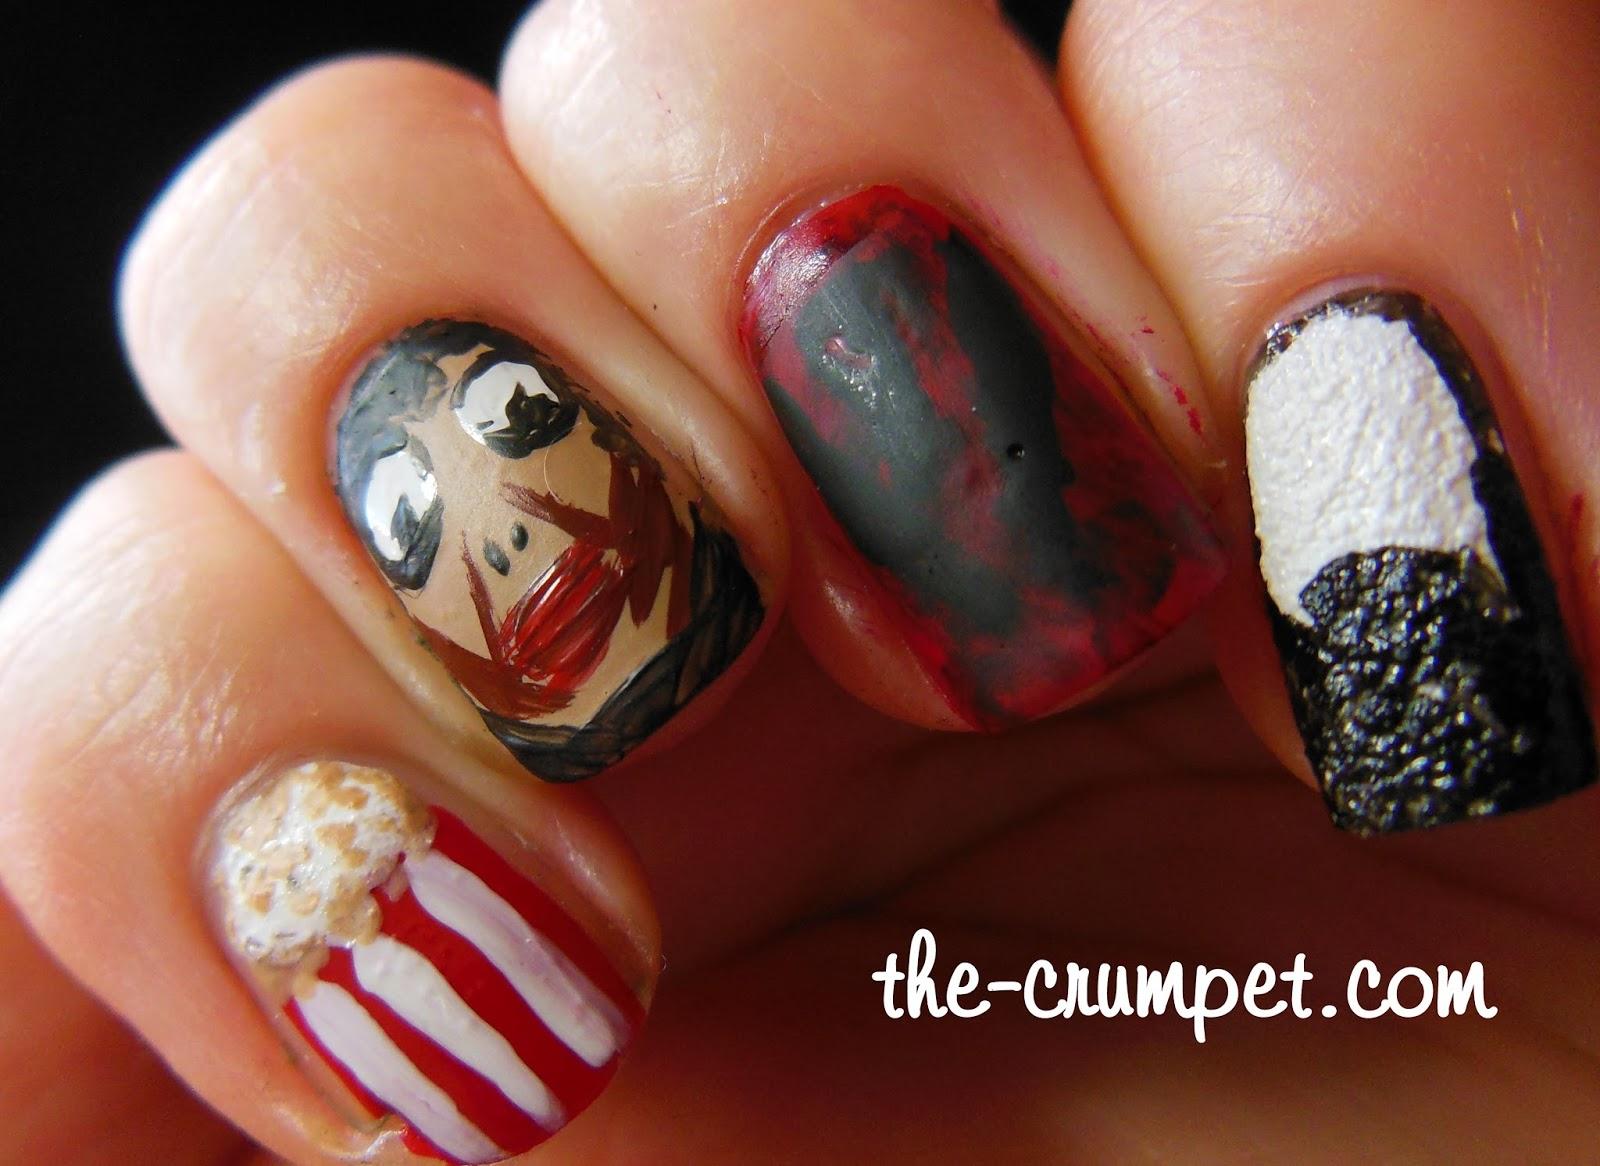 29 fantastic michael jackson nail art ledufa gorgeous michael jackson nail art 27 concerning inspiration article prinsesfo Gallery